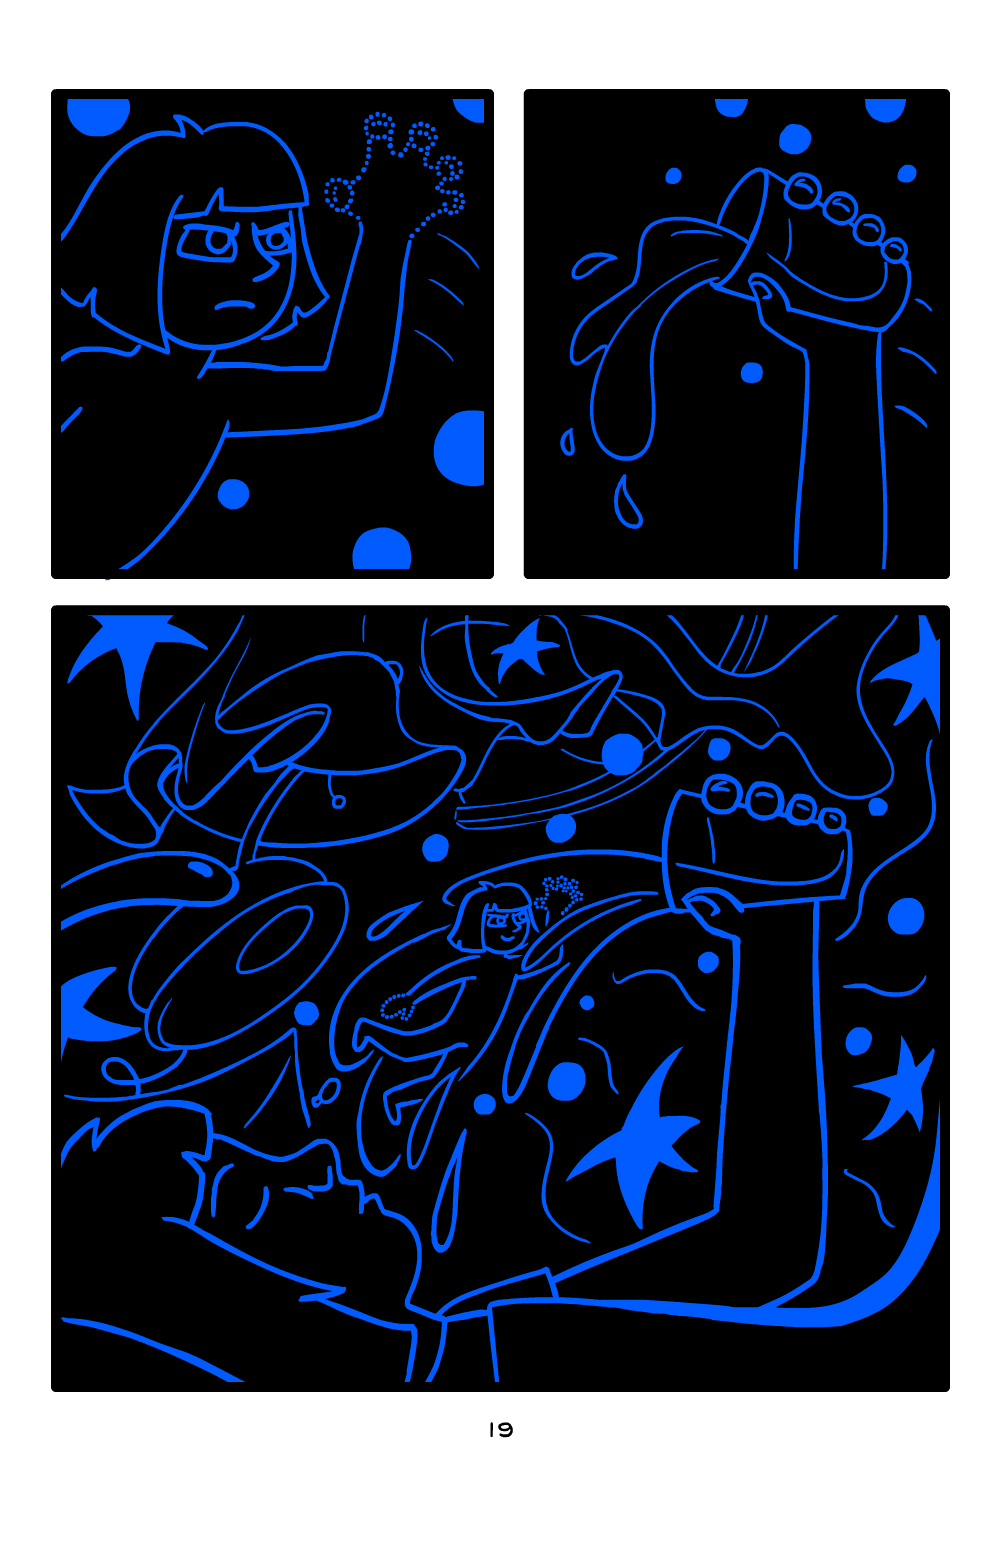 The-Body-Sleeps-9-15-19.jpg